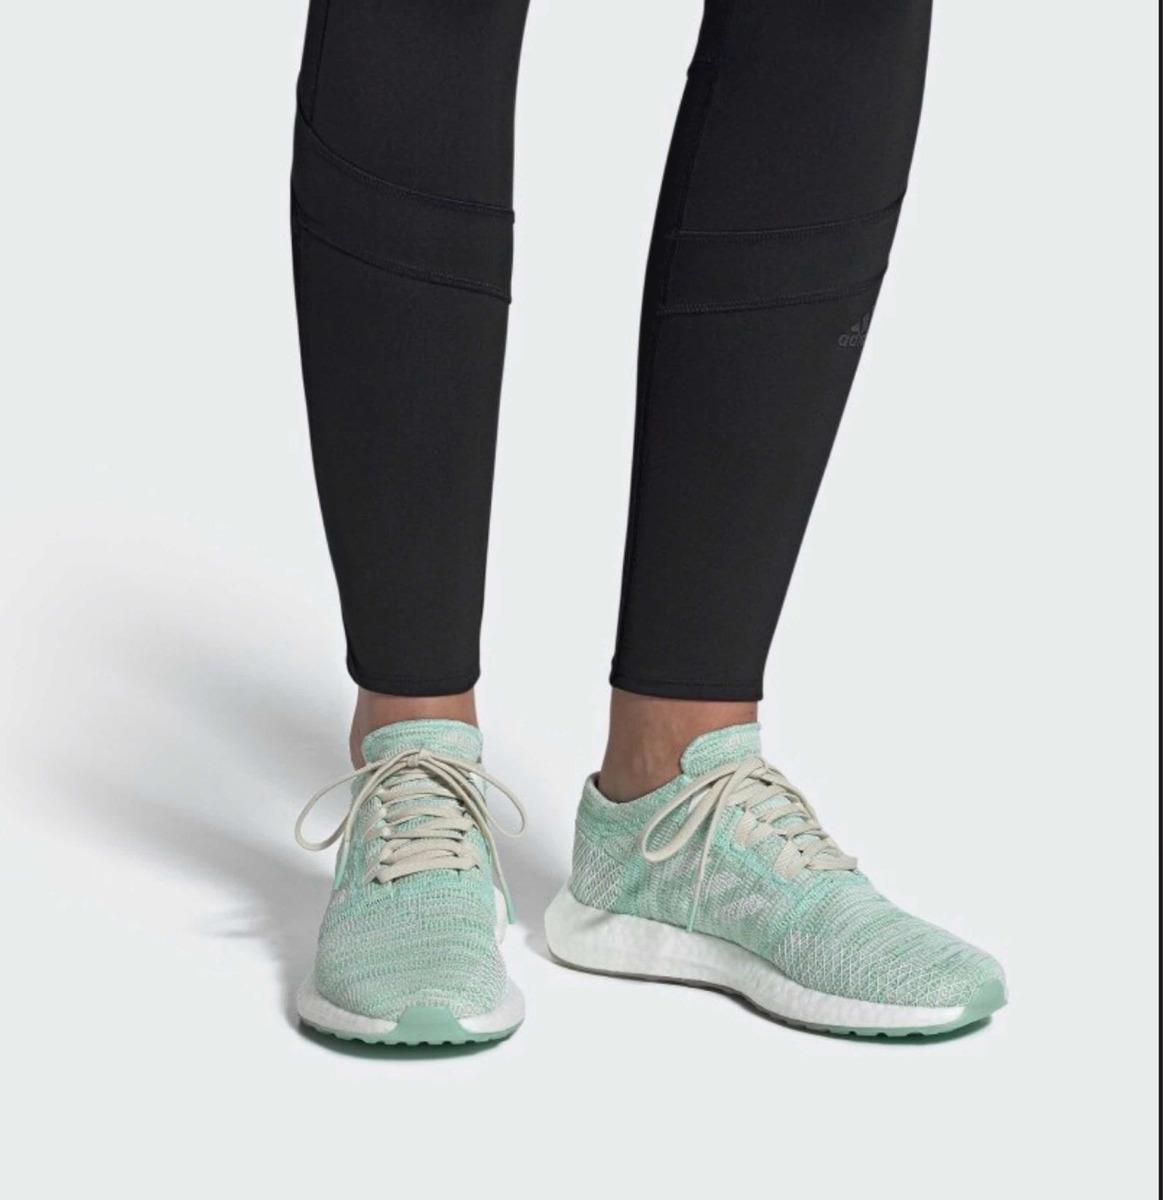 Tenis adidas Pureboost Go Mujer Running 25mx Azul/aqua